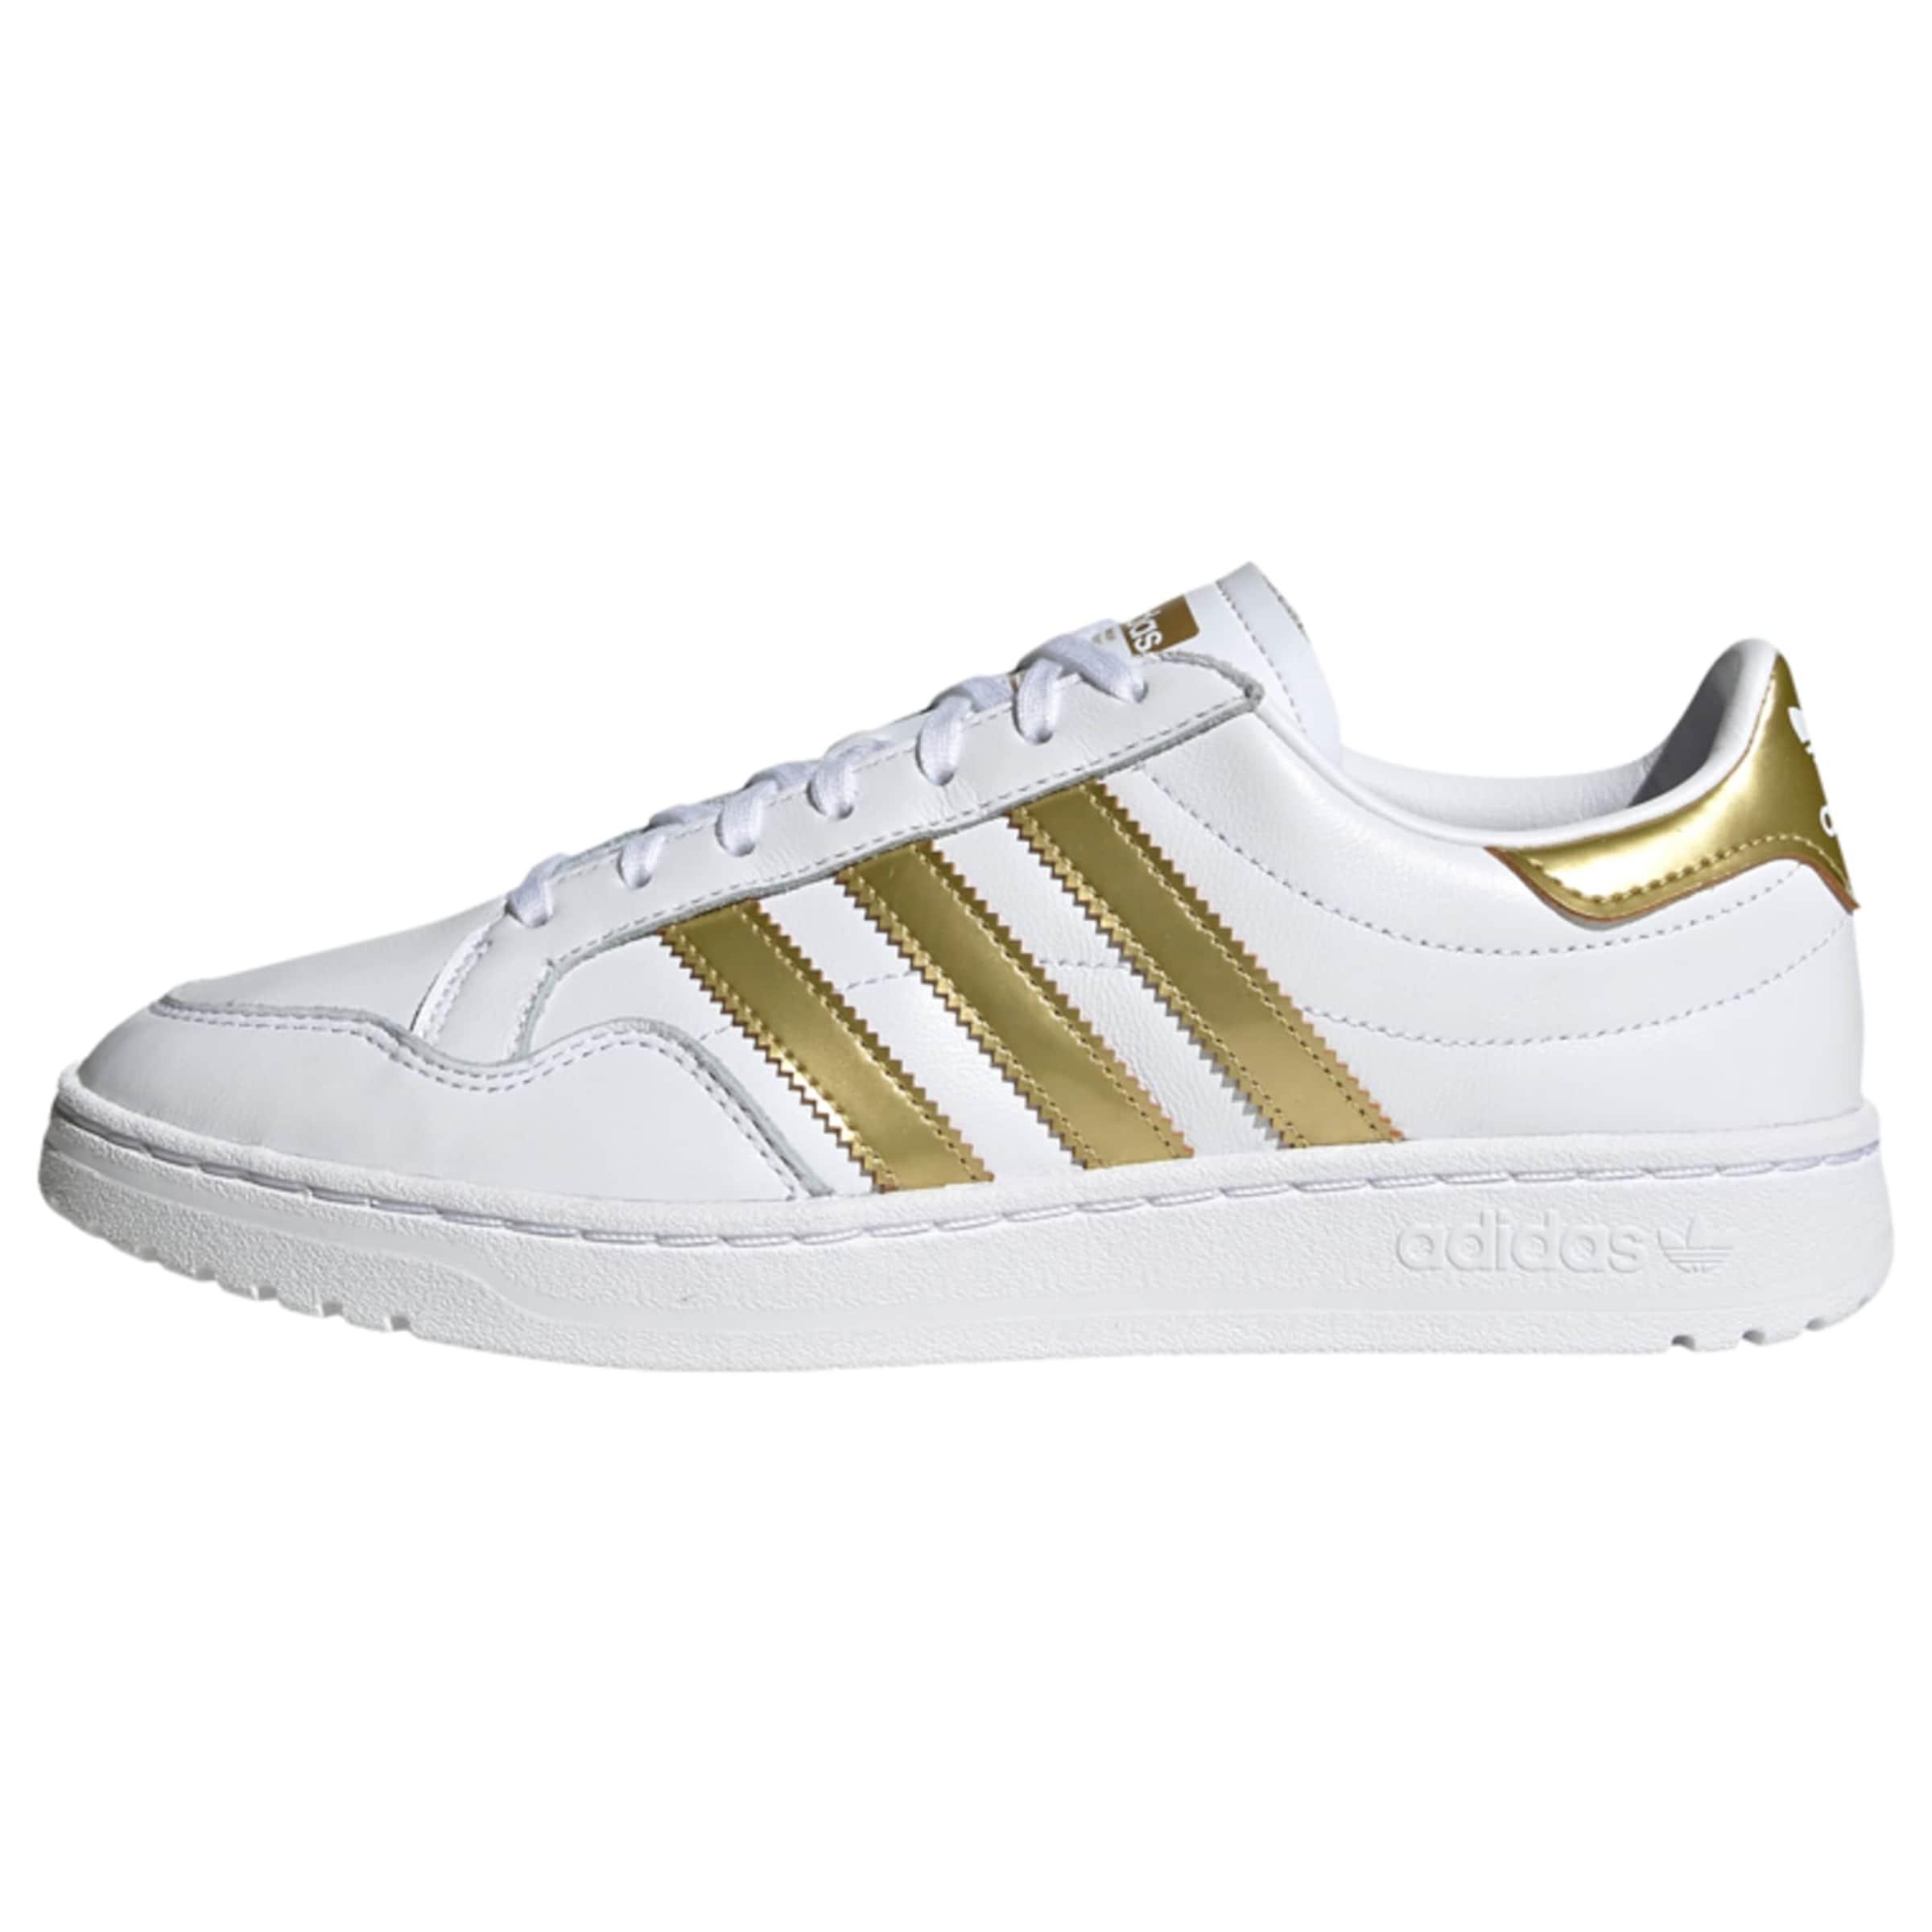 ADIDAS ORIGINALS Team Court Sportmode Sneakers Schuhe in gold / weiß